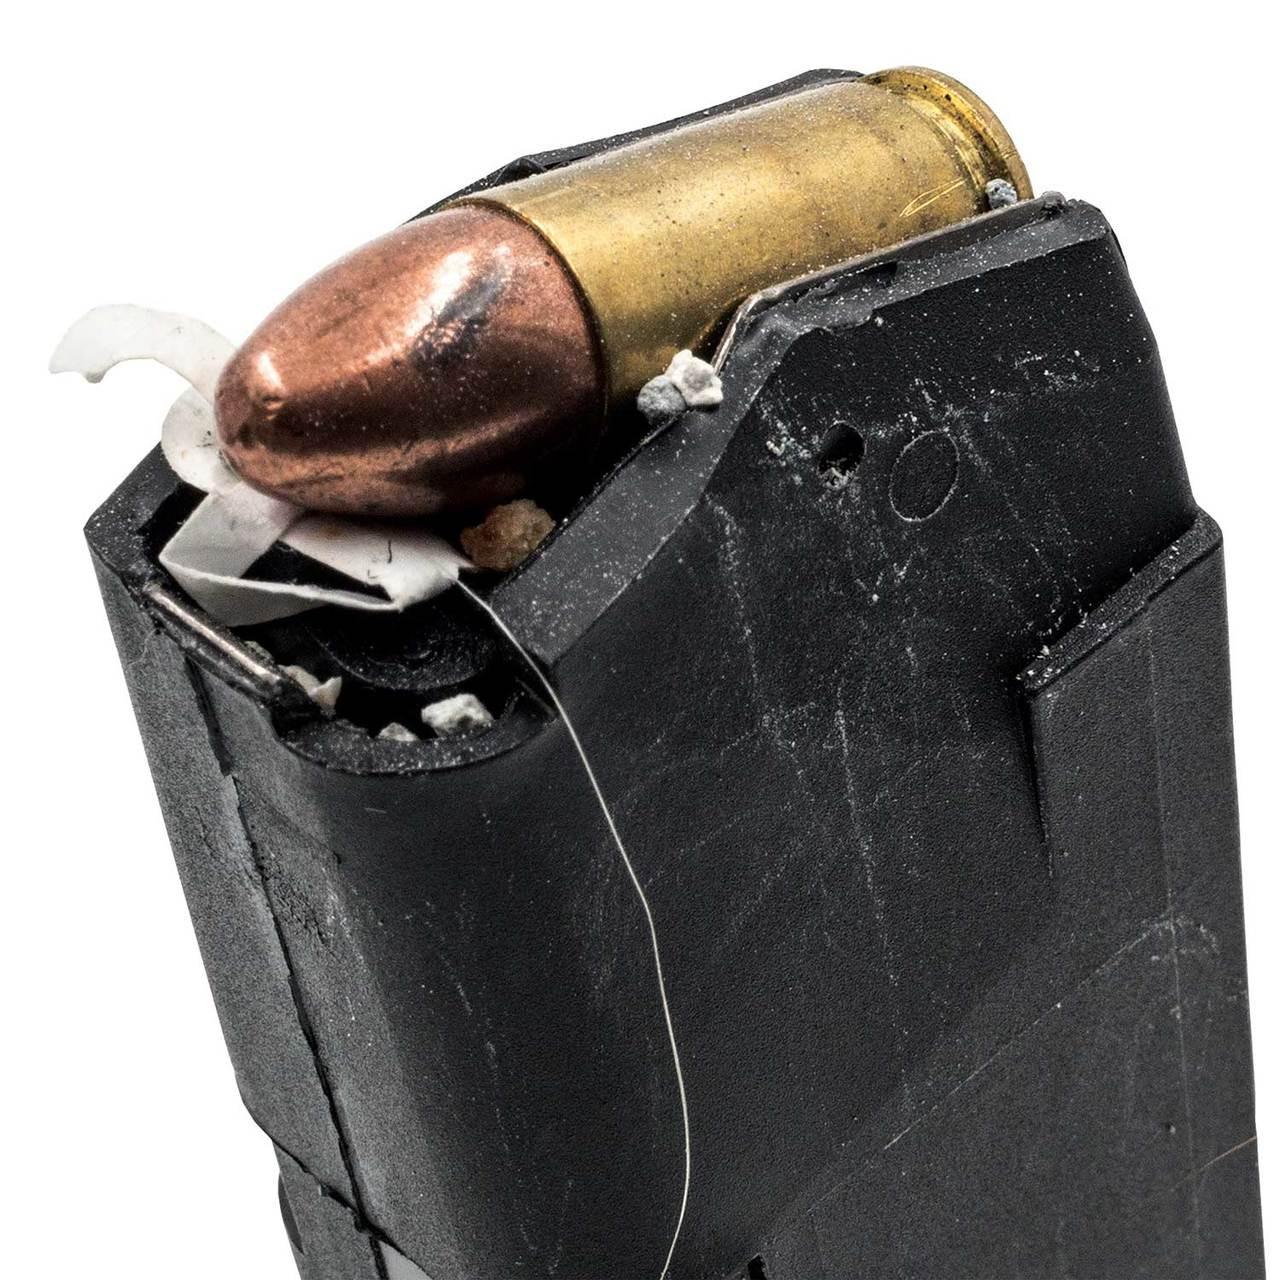 IWI Jericho 941 (.45) Ammo Armor